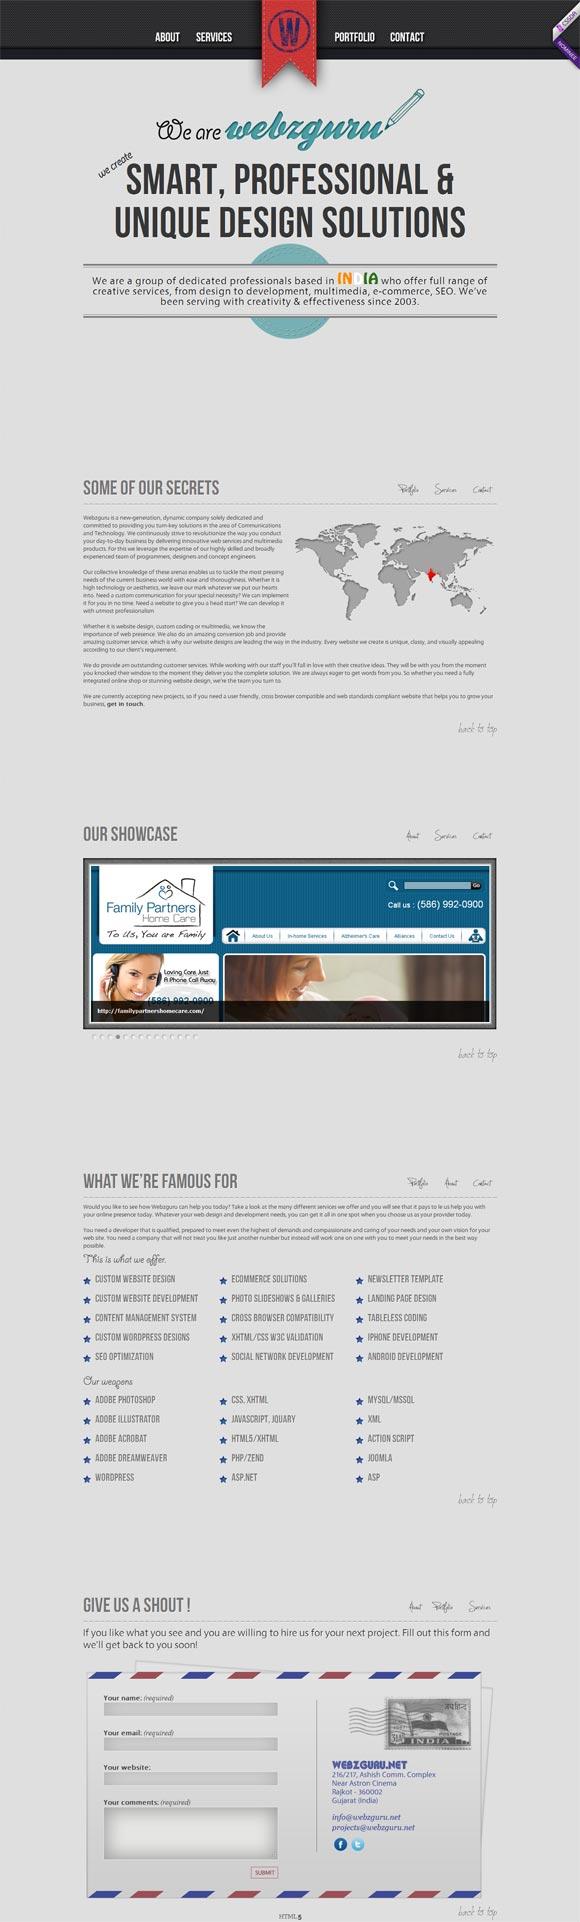 Webzguru | Web Design